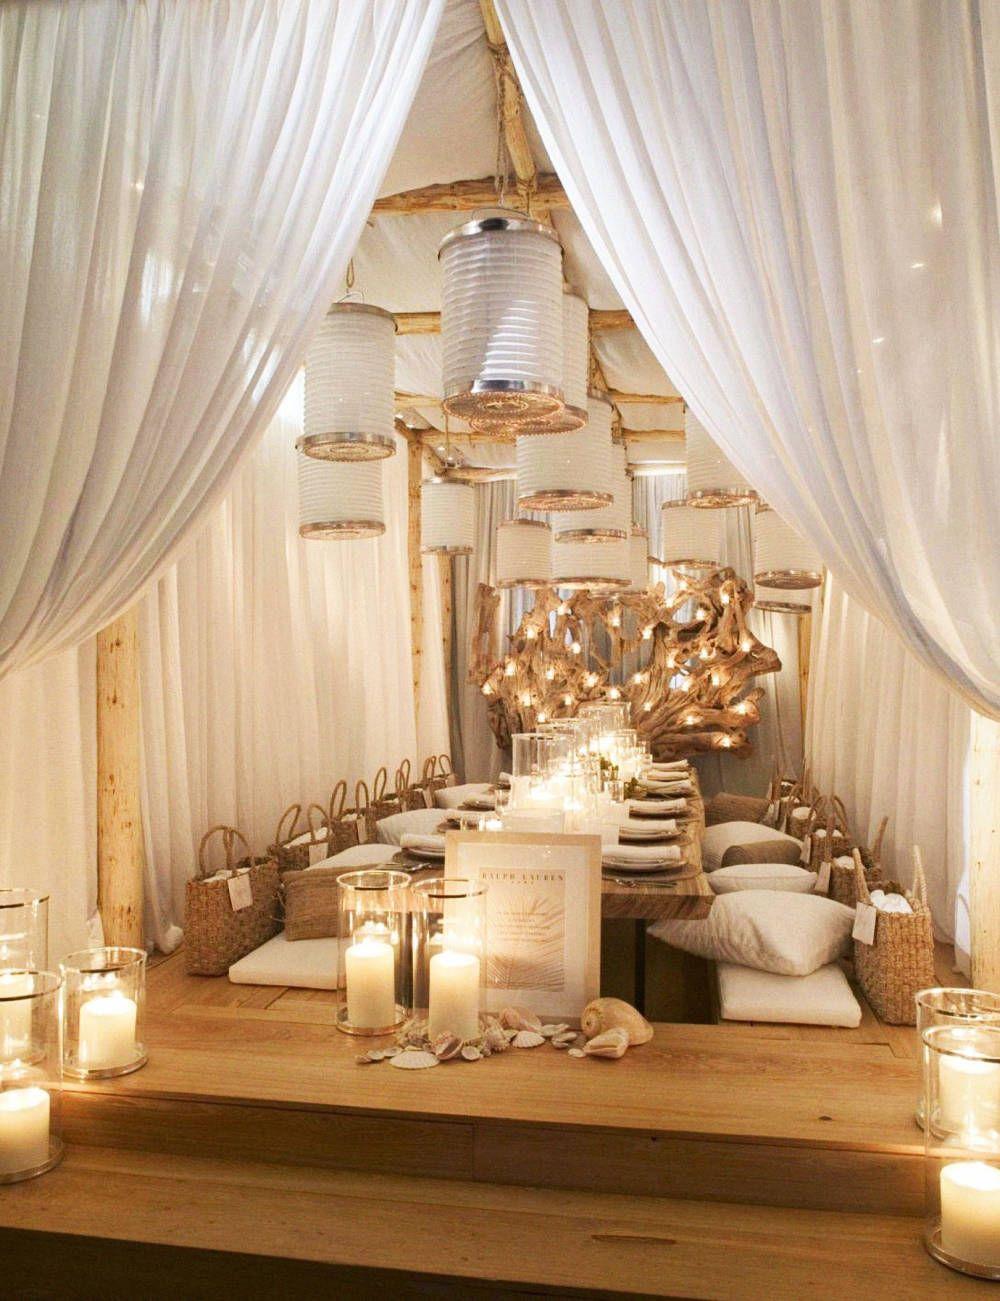 How To Set The Table Like Ralph Lauren | Träume und Wohnideen